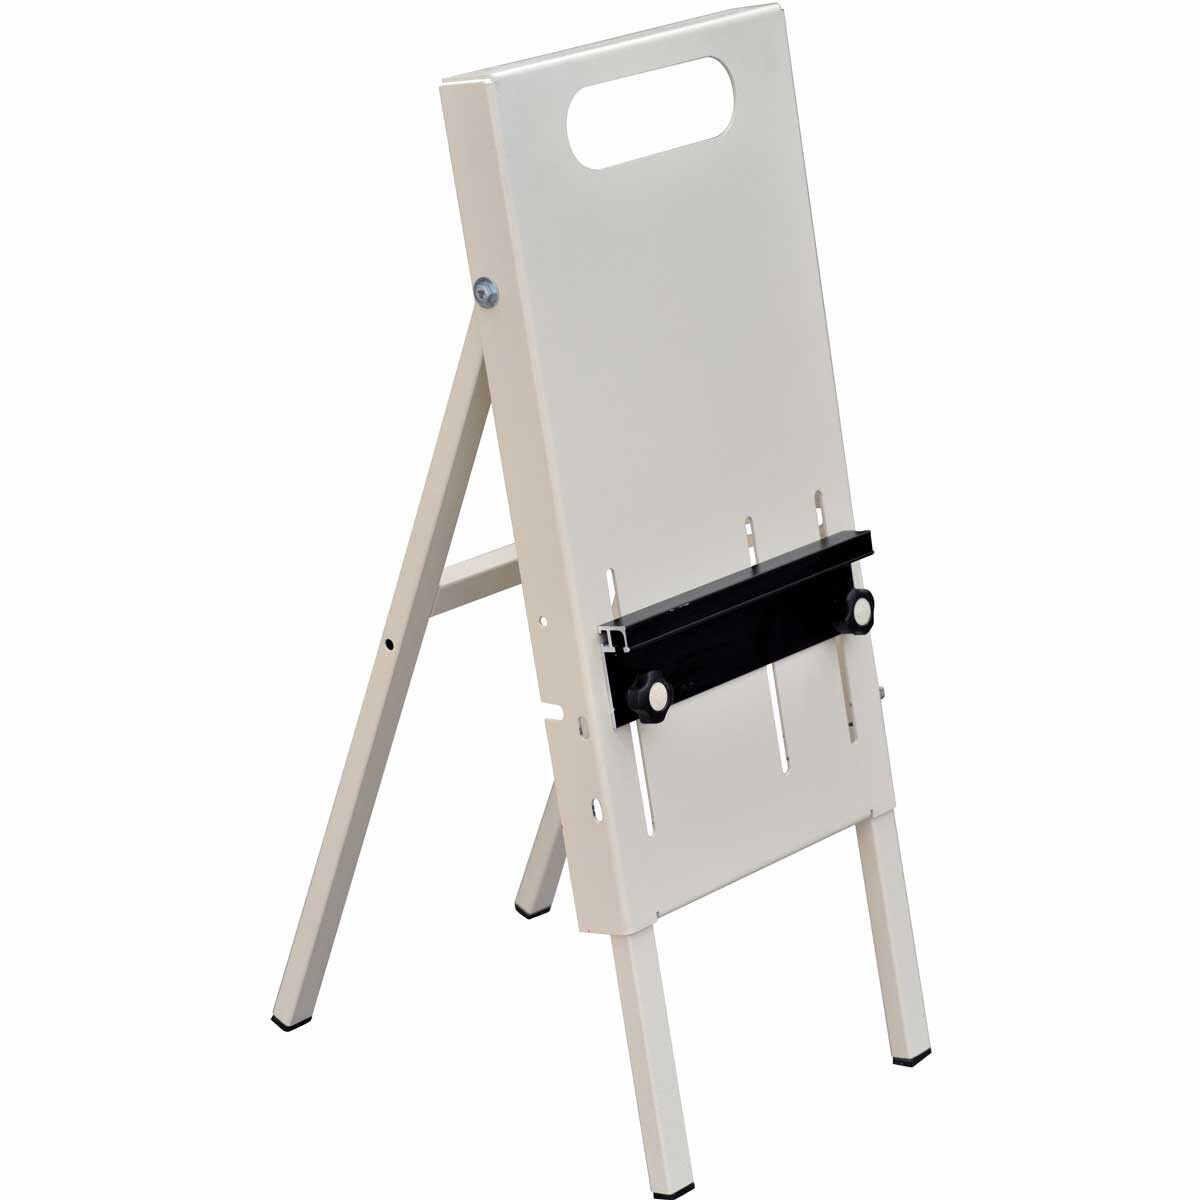 Raimondi LEM Vertical Wet Saw Stand